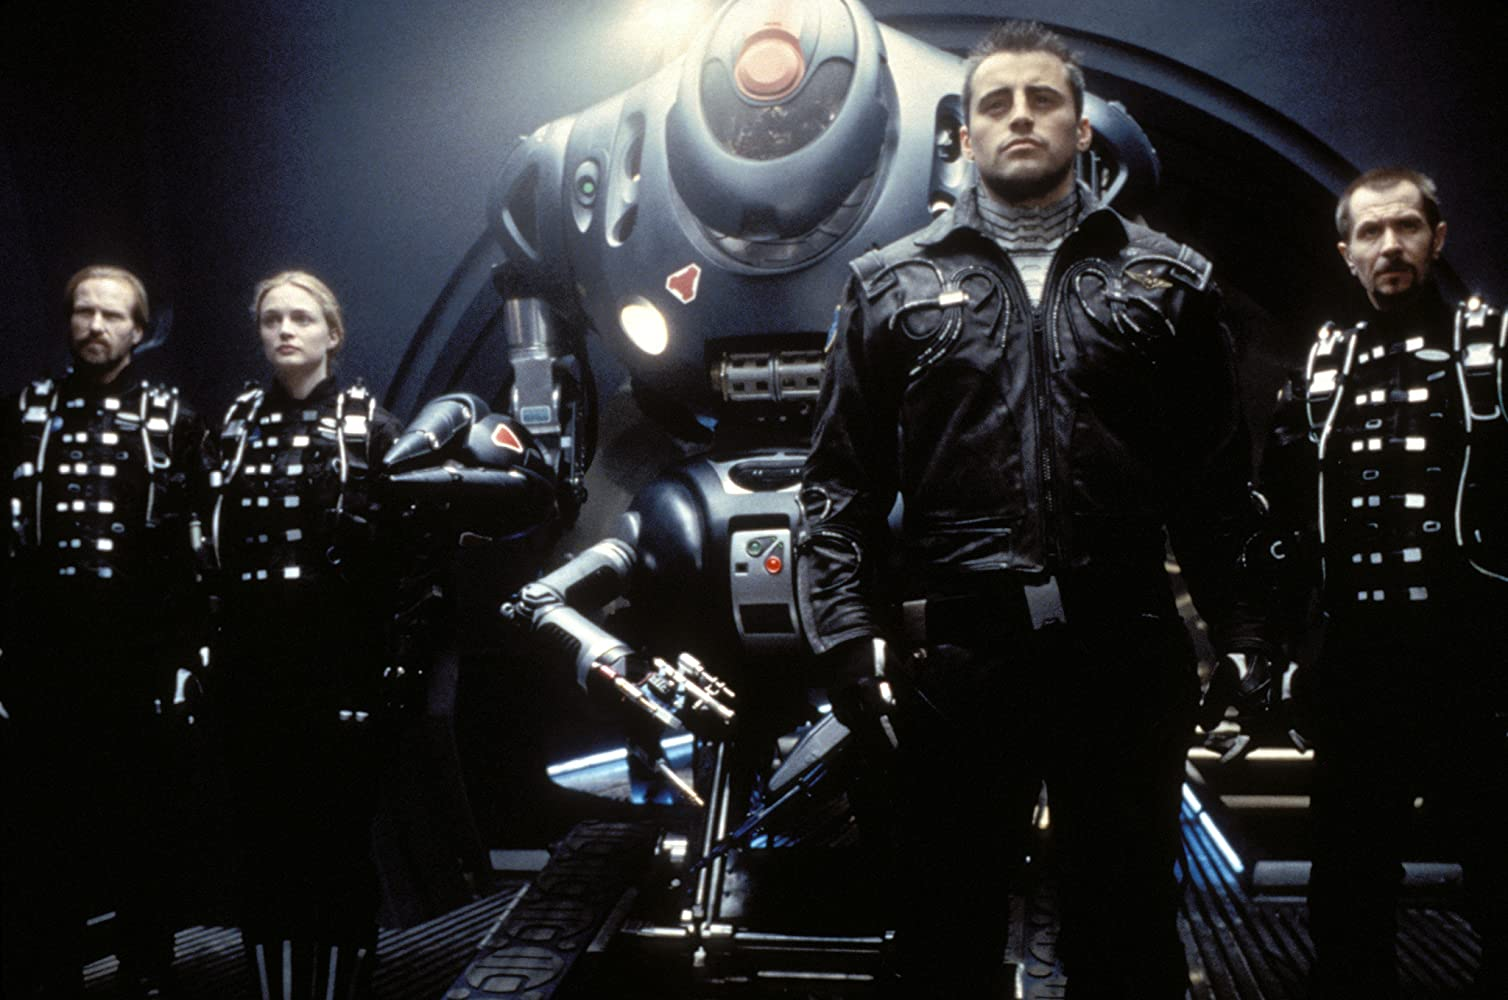 Gary Oldman, William Hurt, Heather Graham, and Matt LeBlanc in Lost in Space (1998)